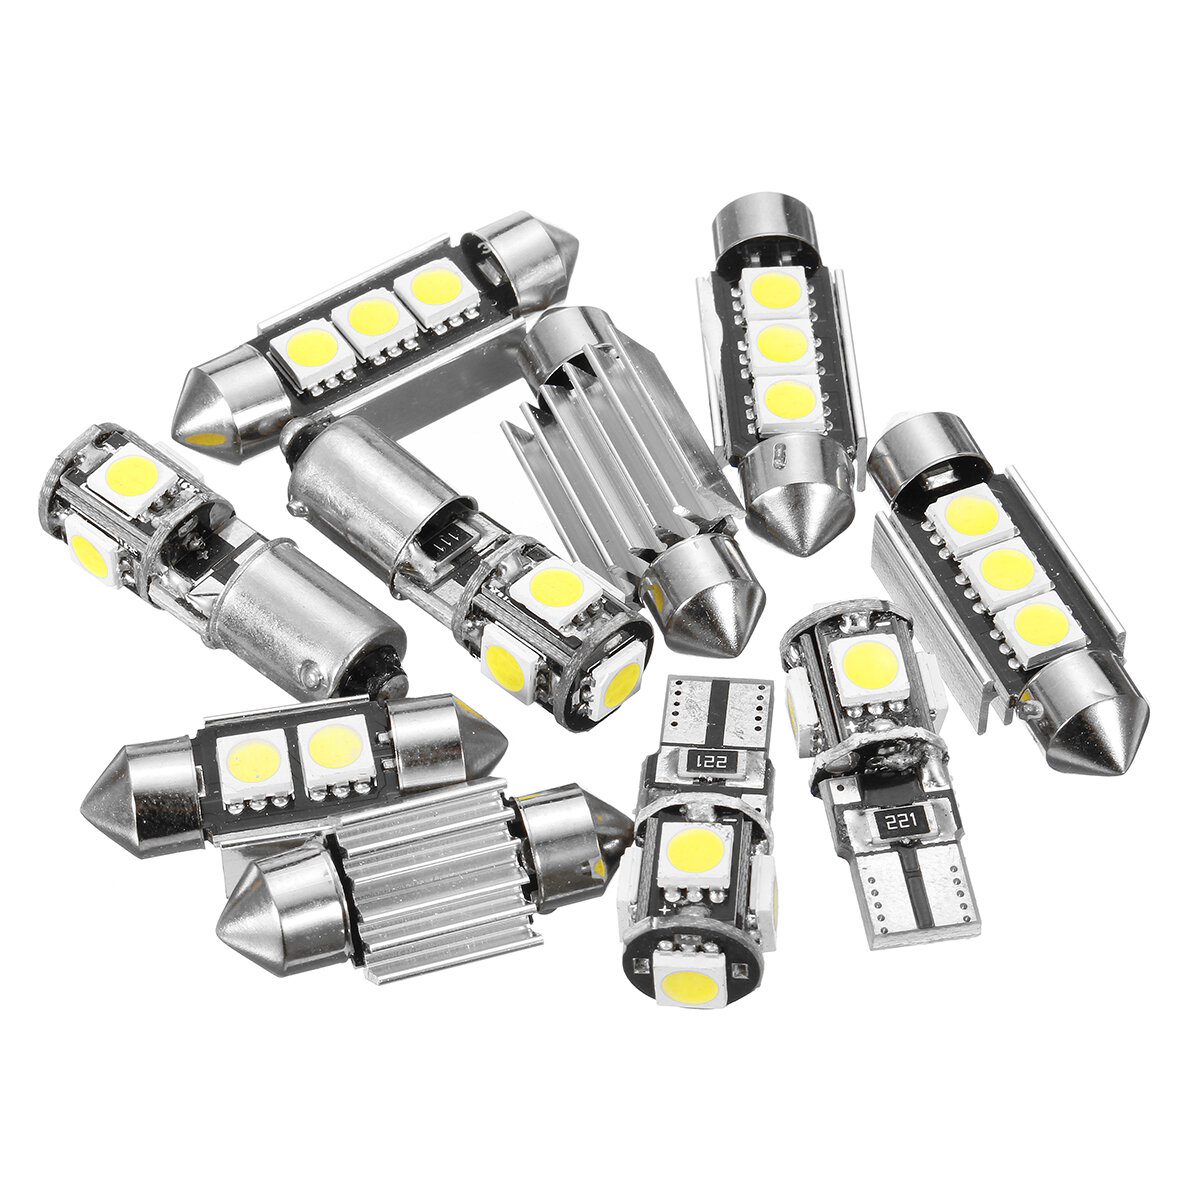 12v White Car Interior Led Lamp Replacement Bulb Reading